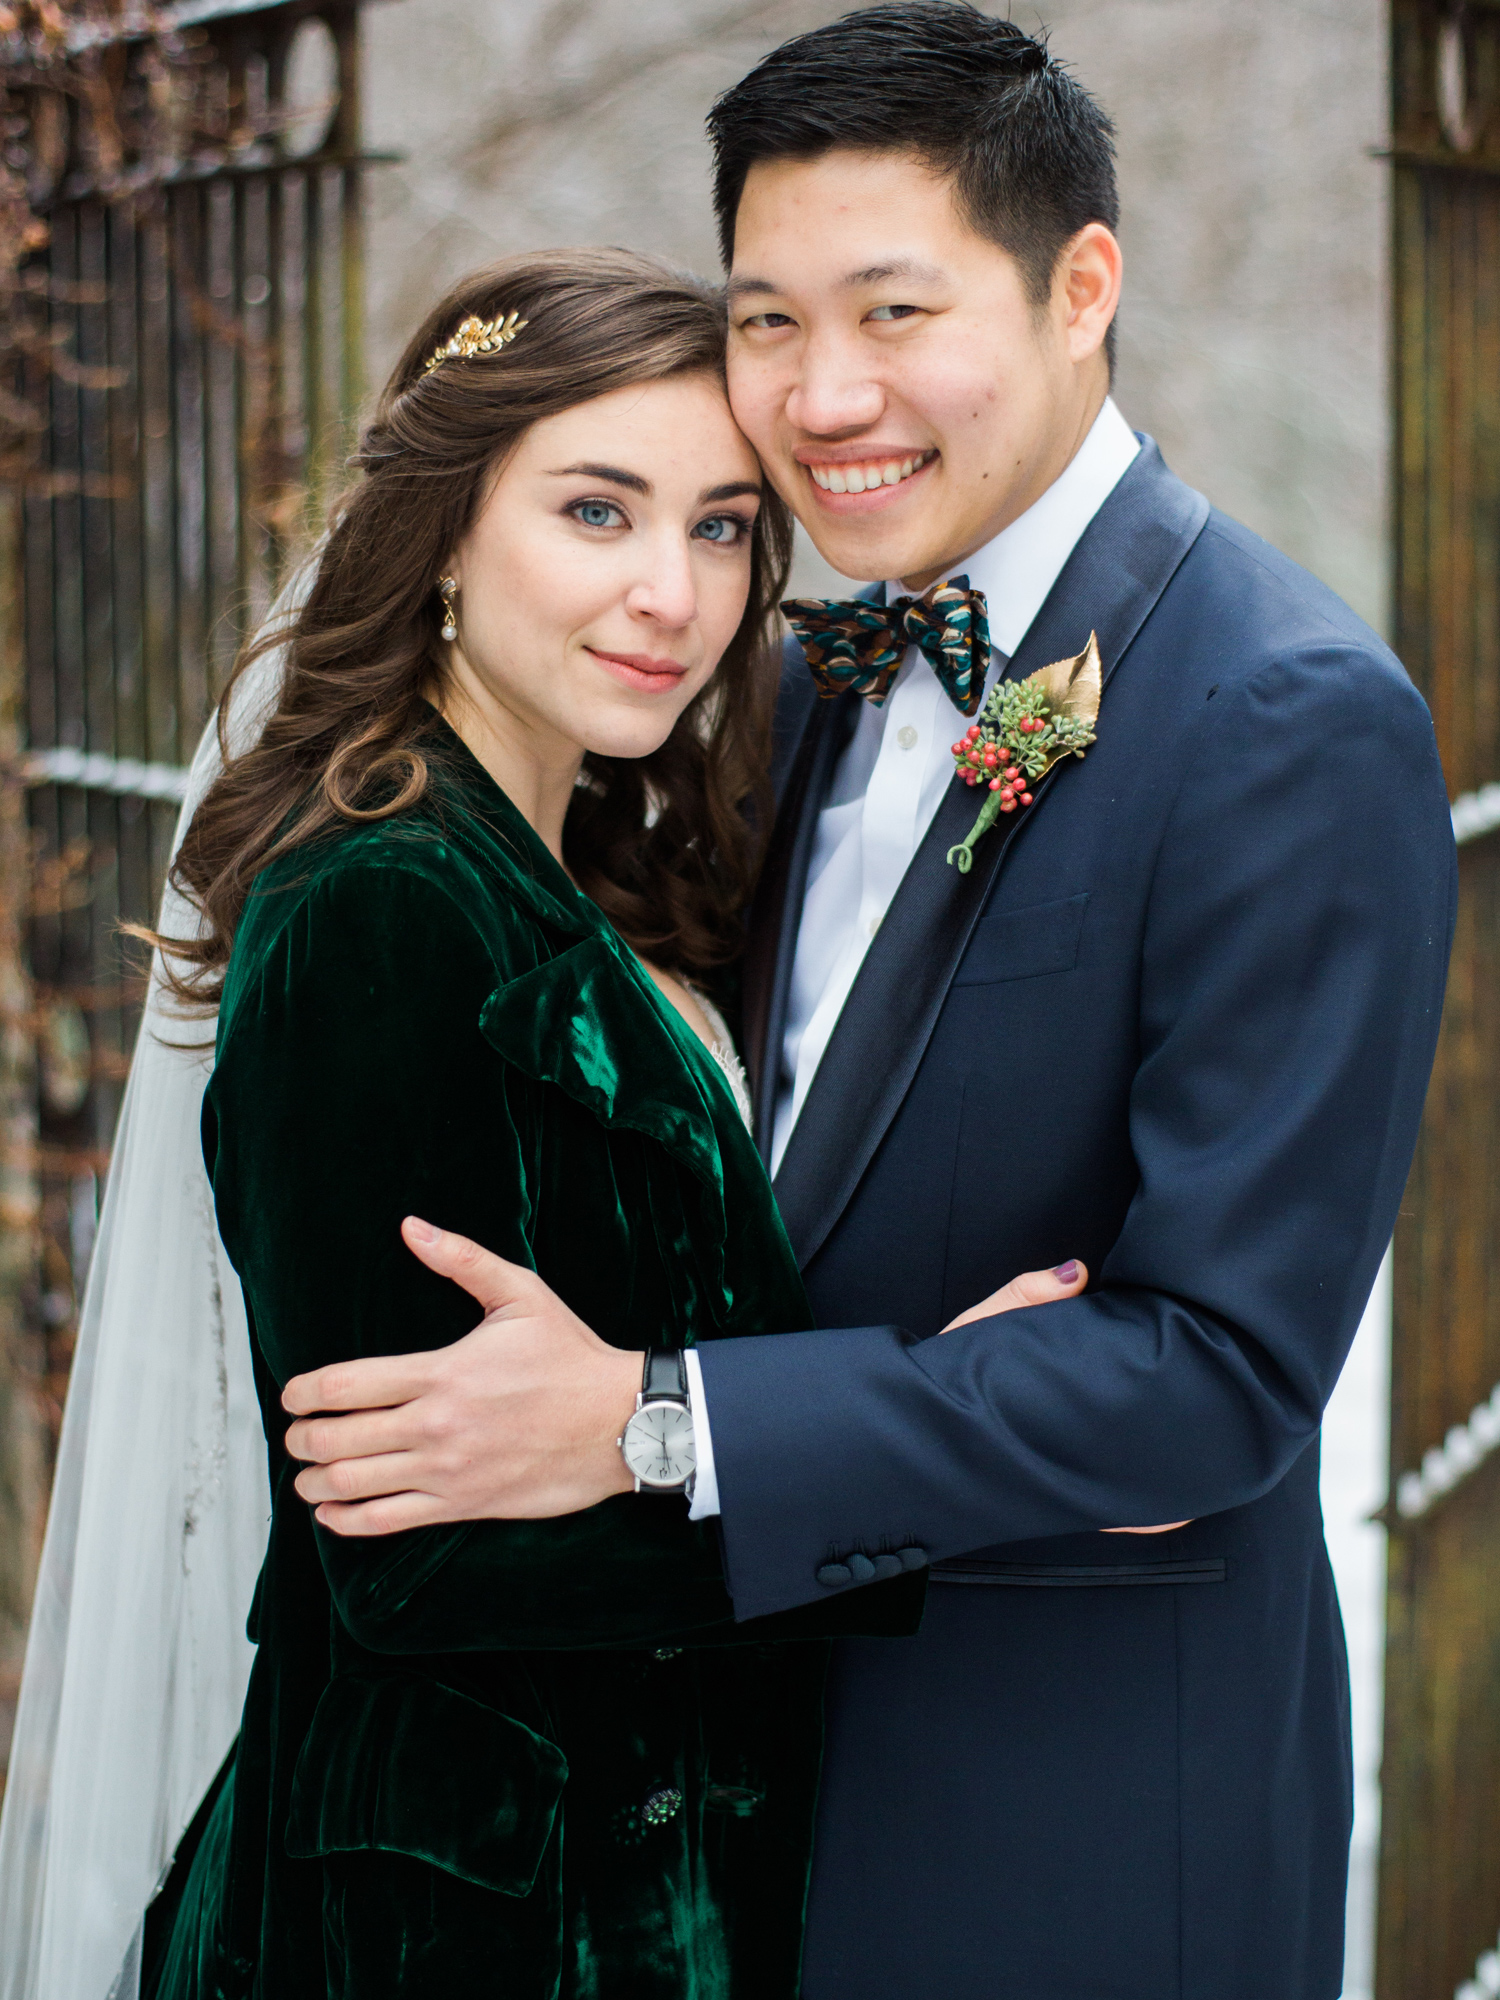 Siousca_Photography_Philadelphia_wedding_Photographer_Holly_Hedge_estate_new_hope_west_chester_19.jpg